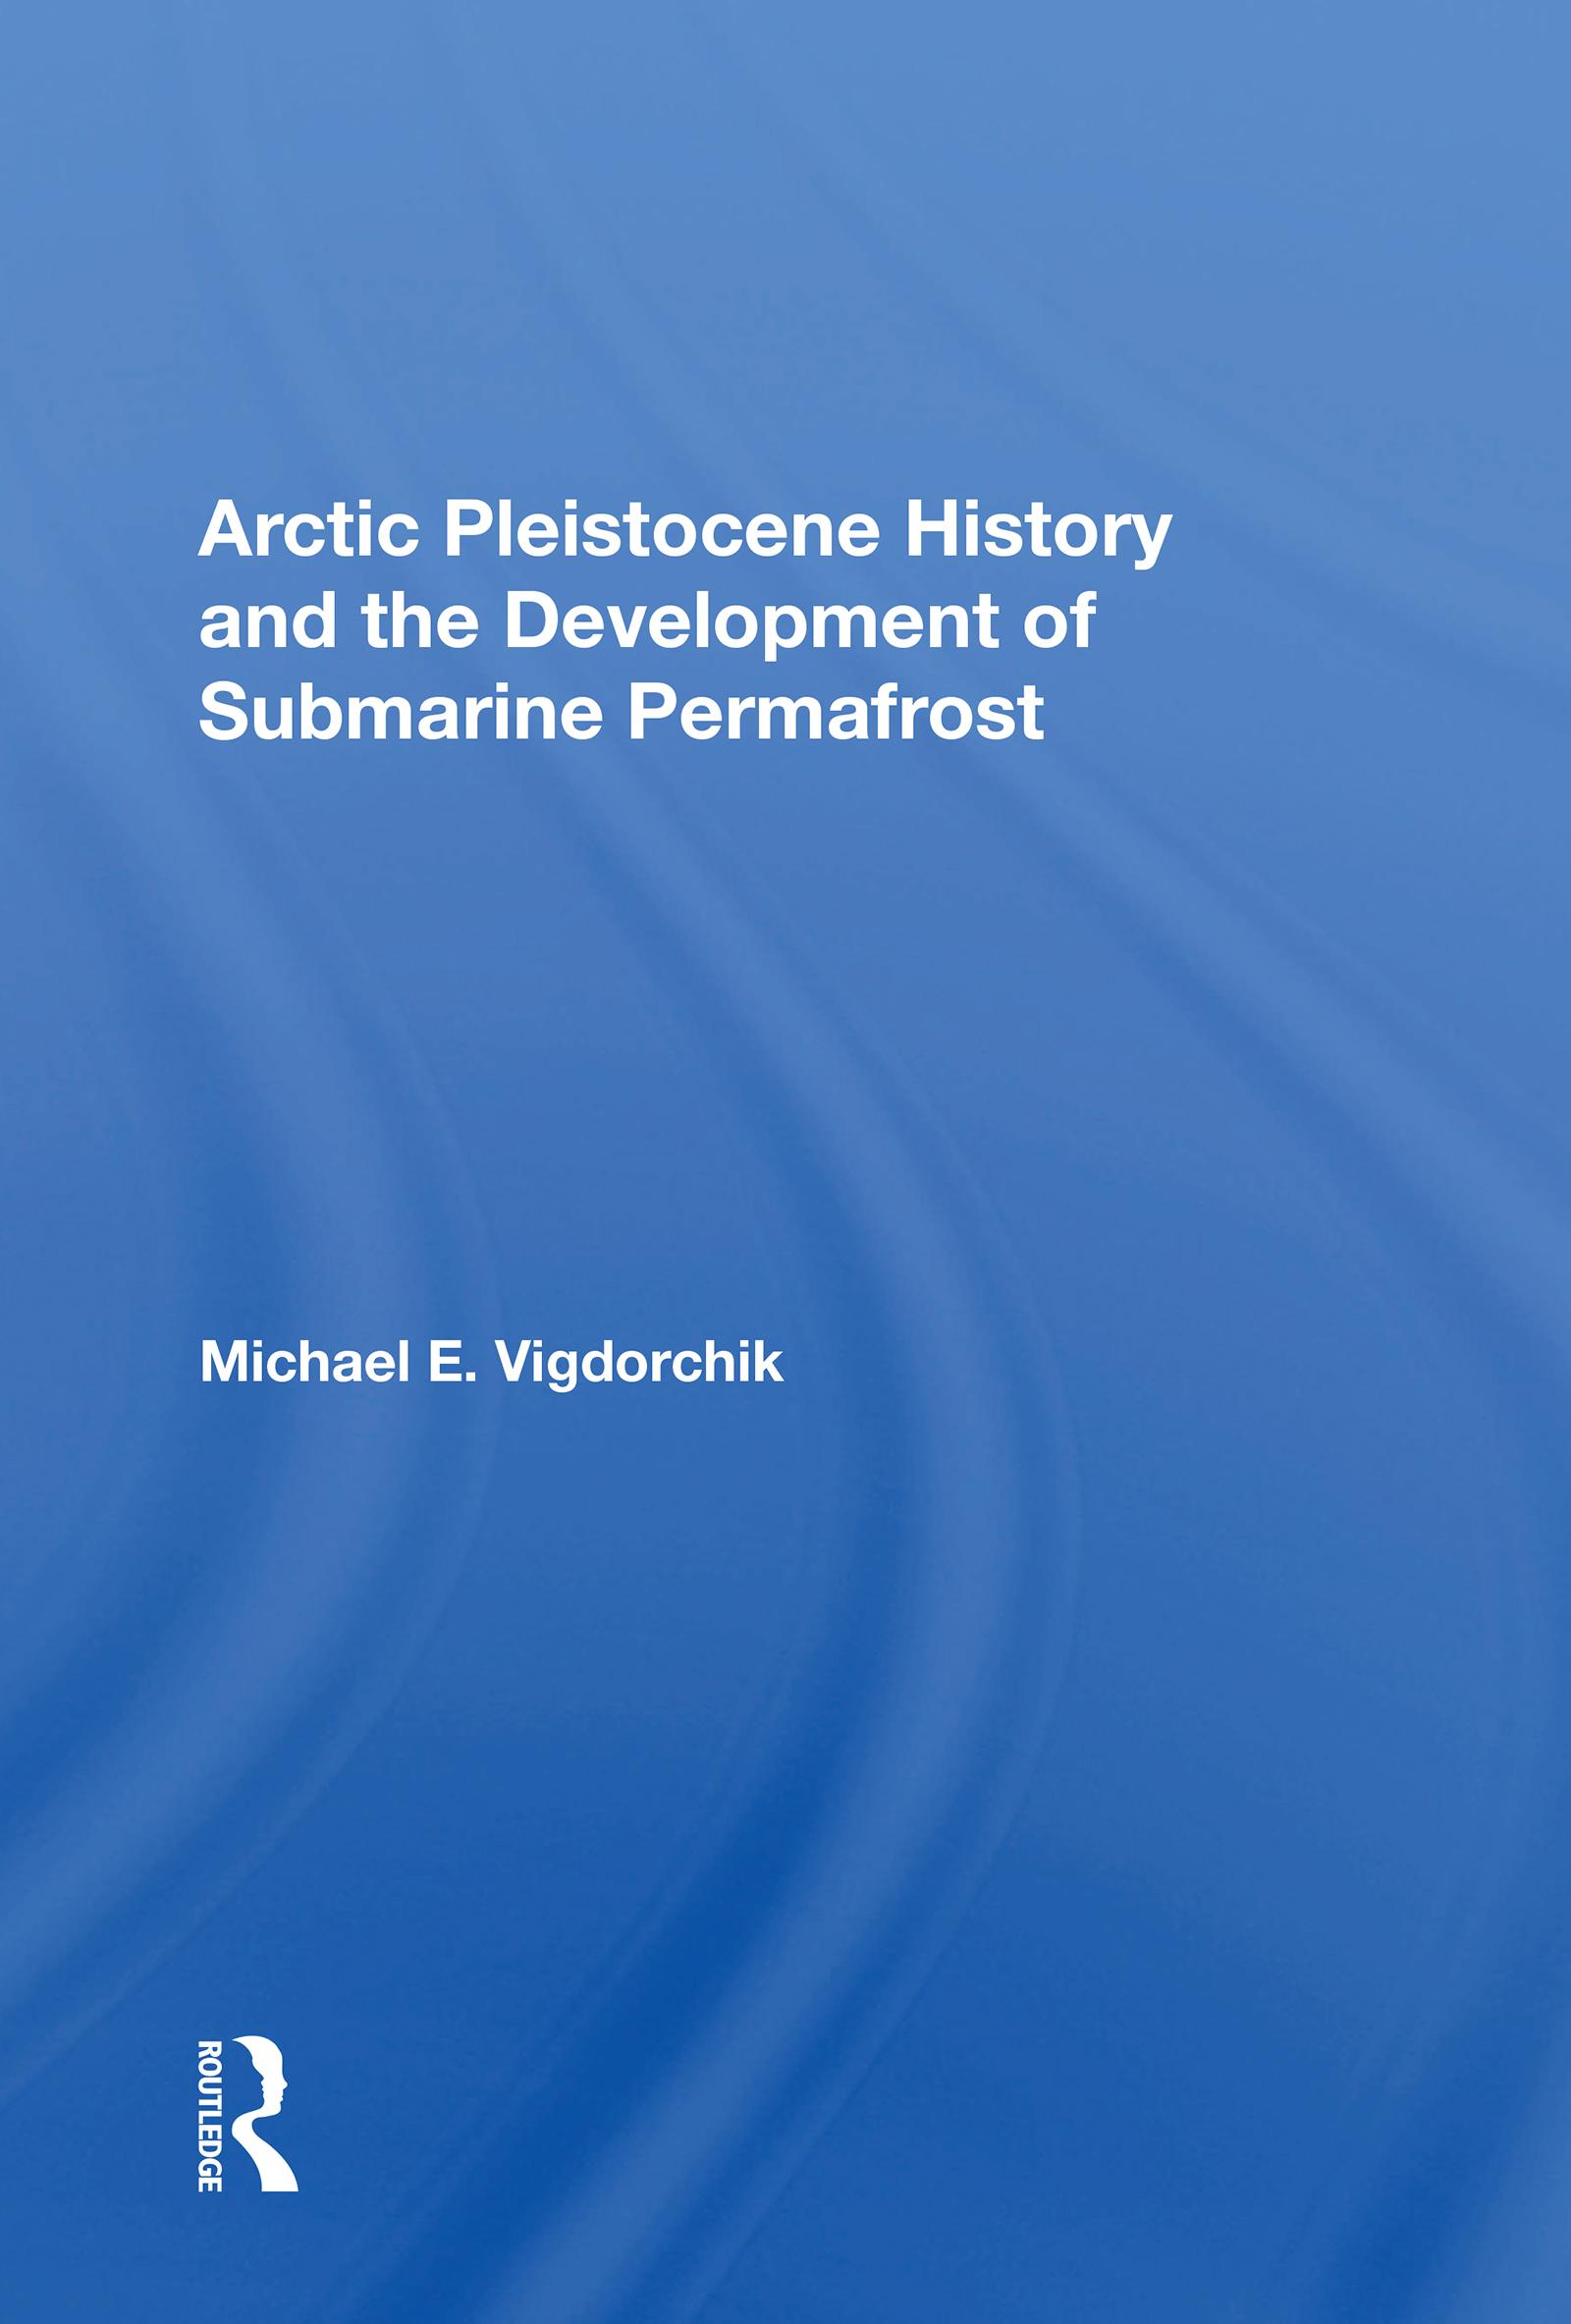 Arctic Pleistocene History and the Development of Submarine Permafrost